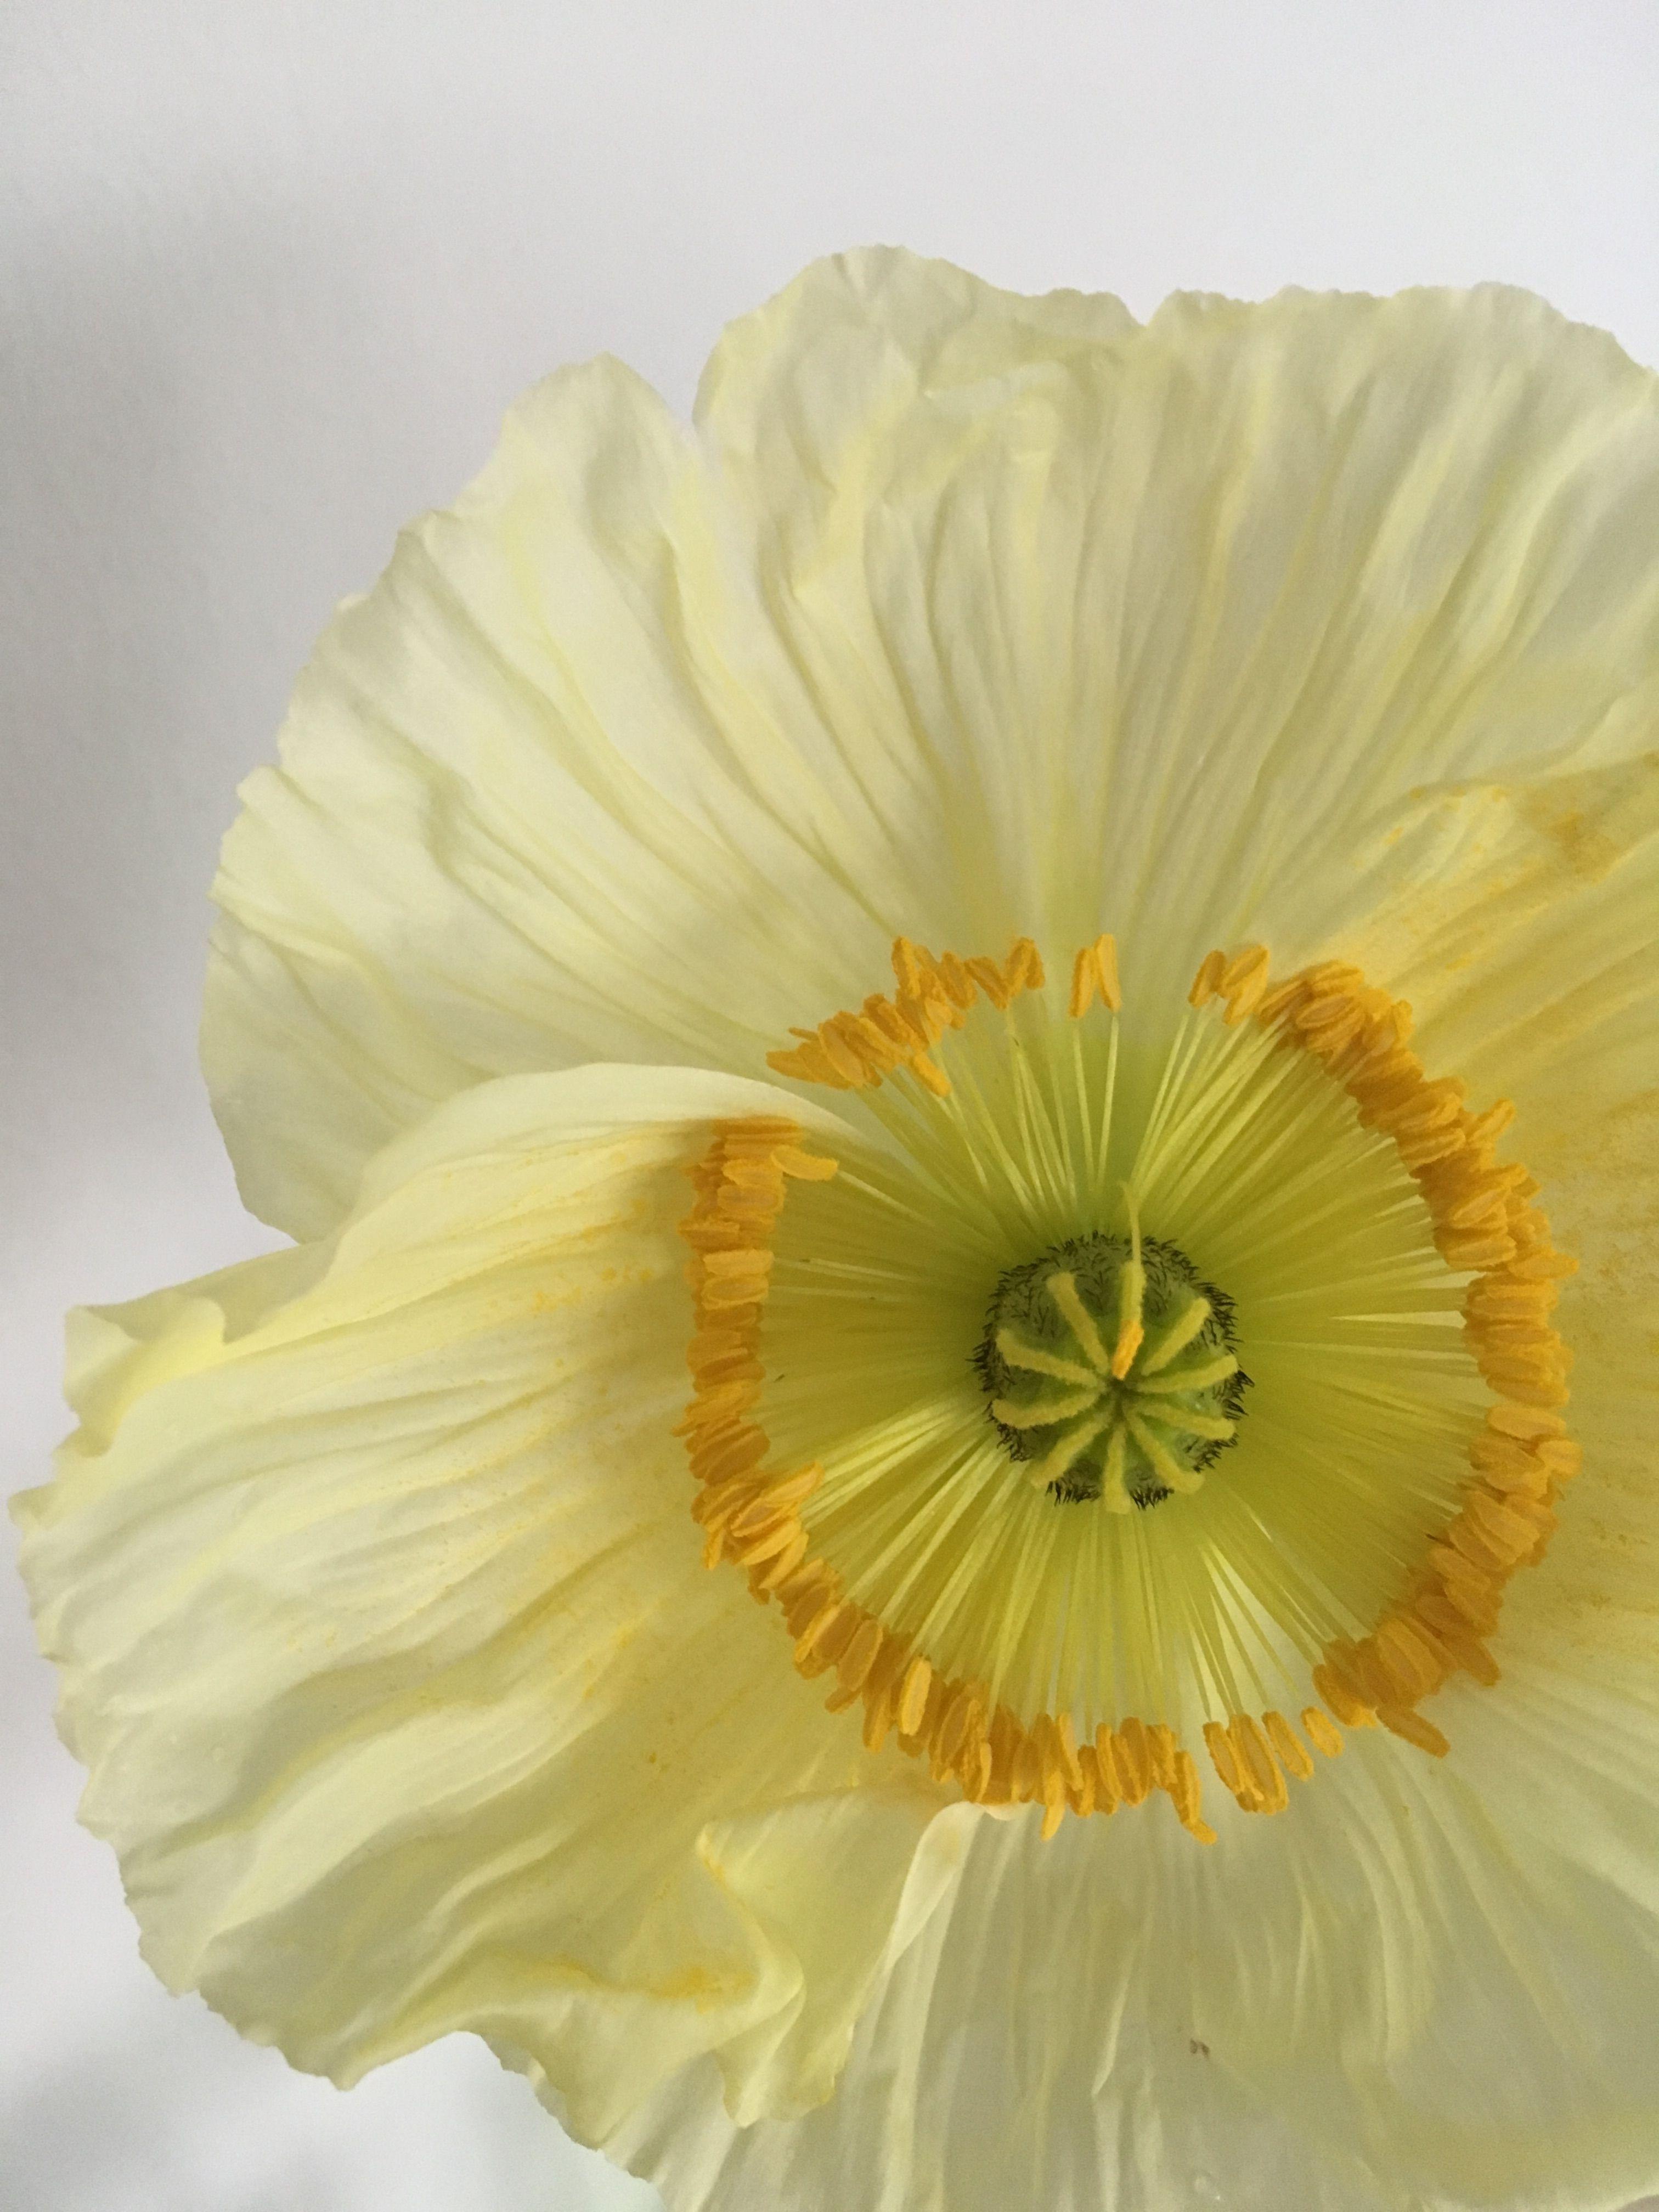 Rosa S Fotos Bild Von Rosemarie Stosser Mohnblume Blumen Mohn